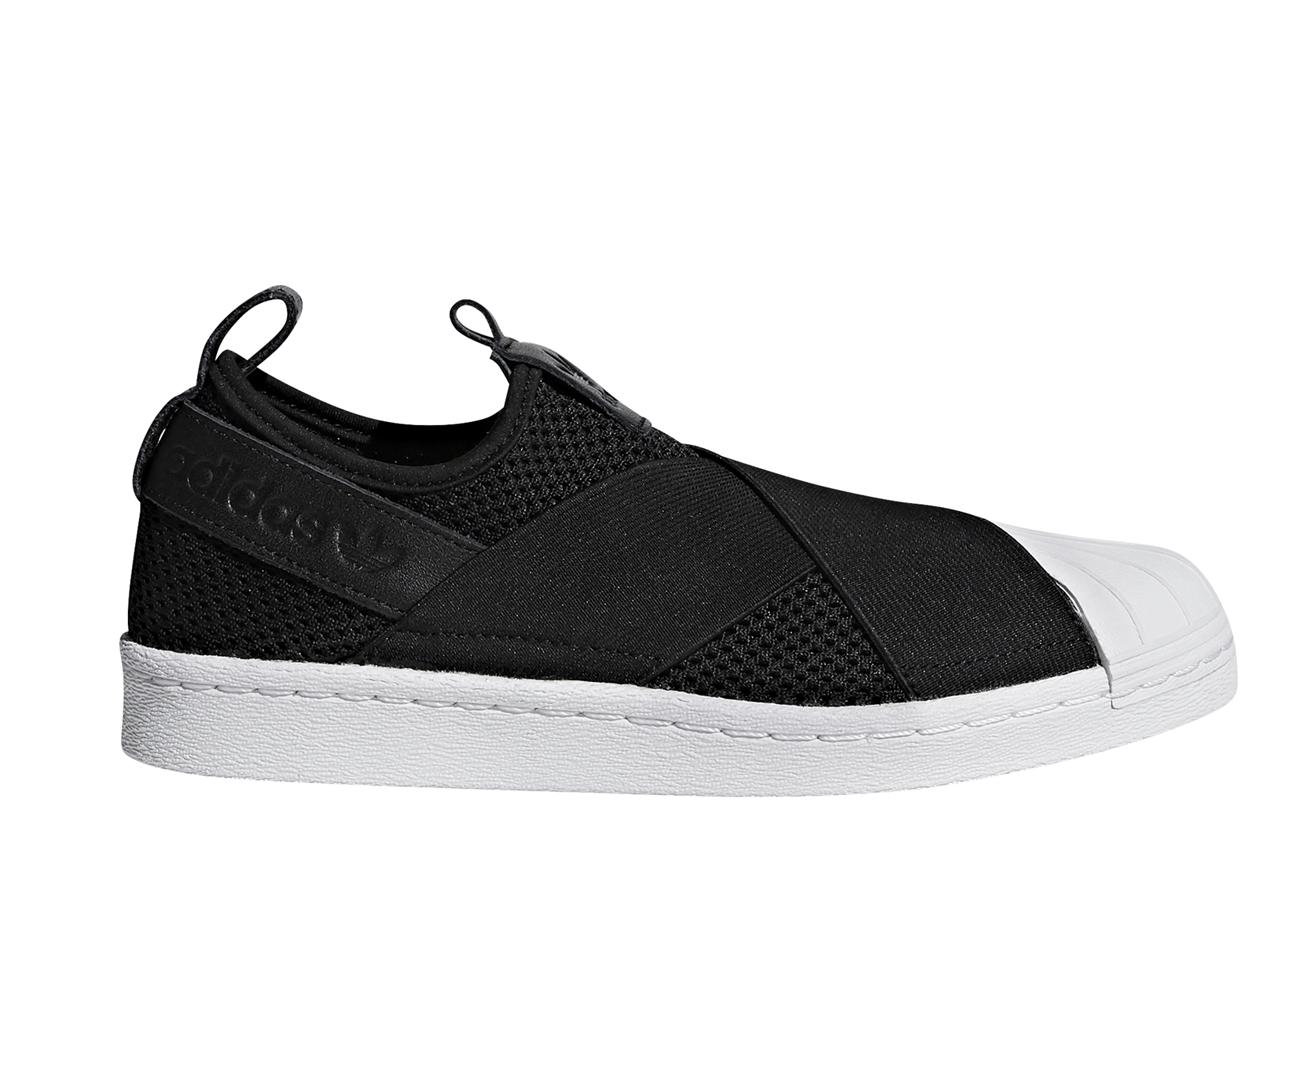 Adidas Originals Superstar SlipOn W manelsanchez.pt